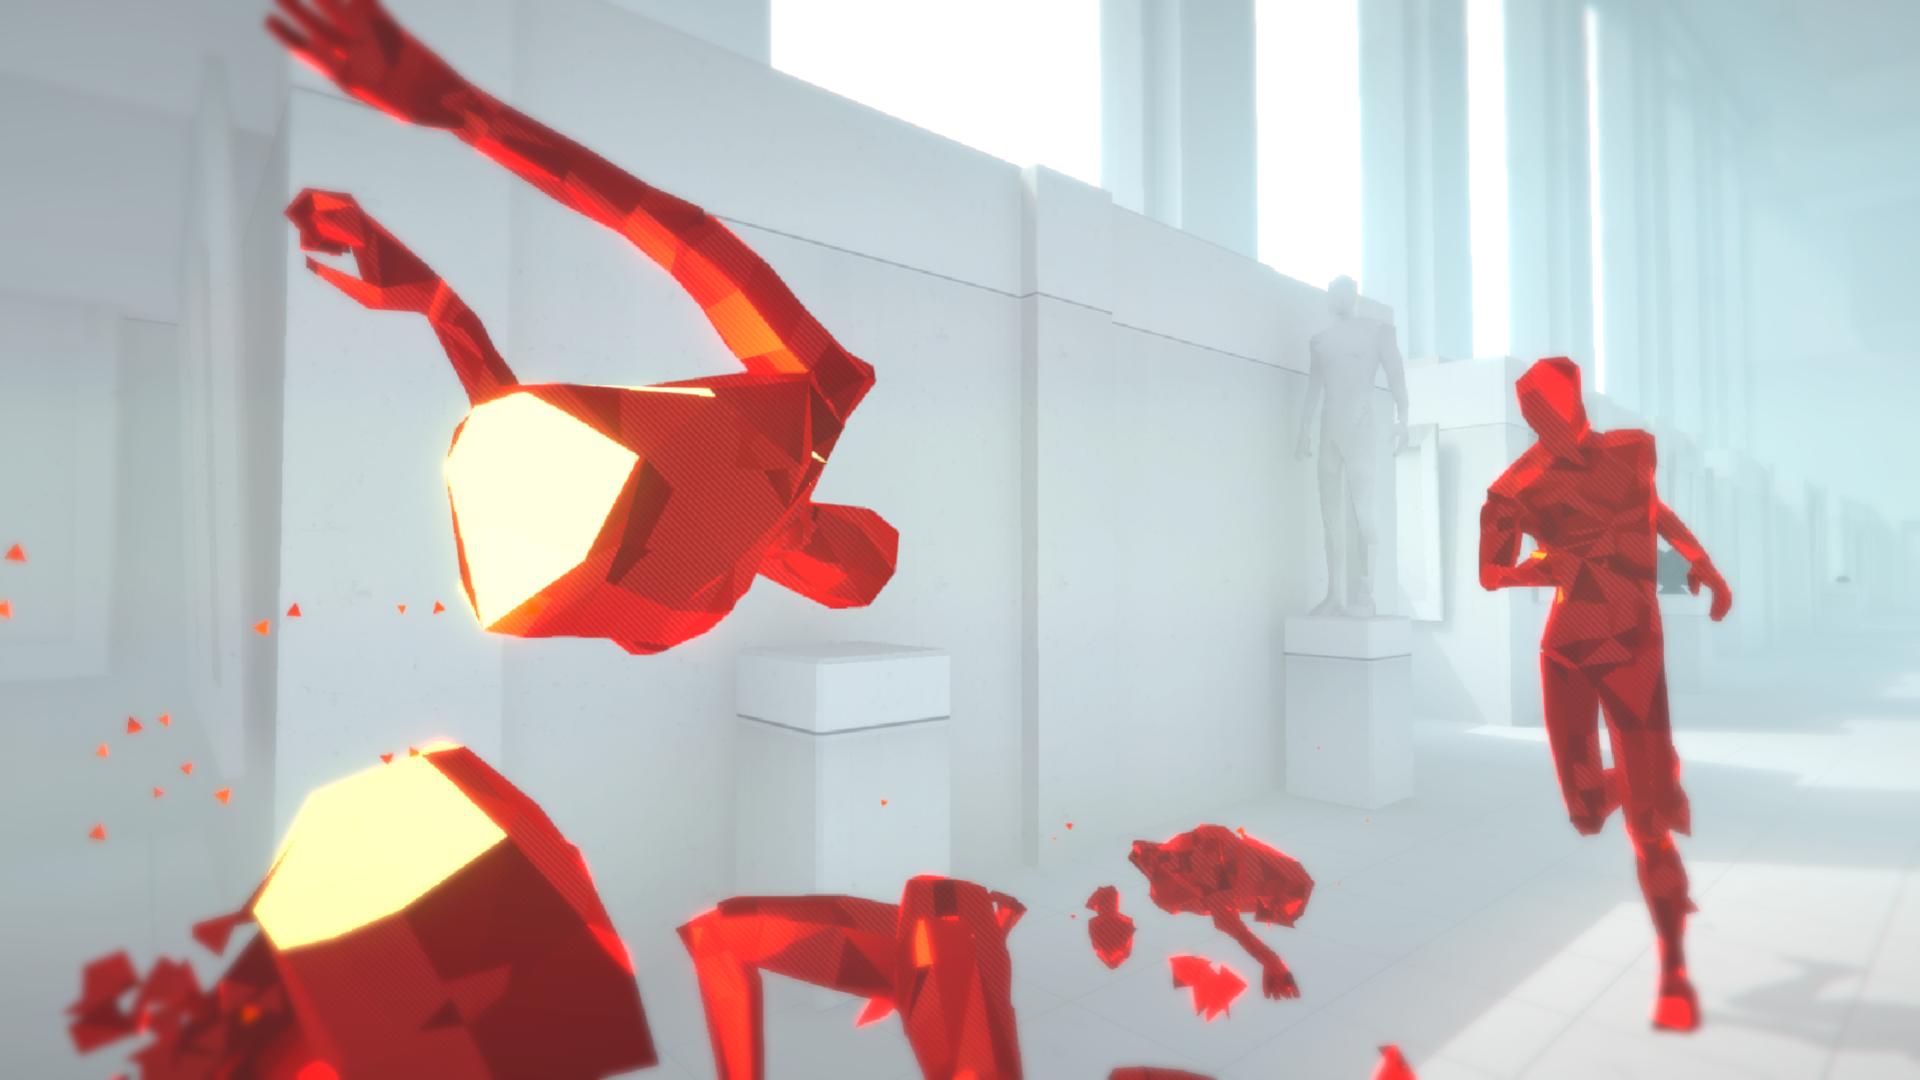 superhot video game desktop wallpaper 61485